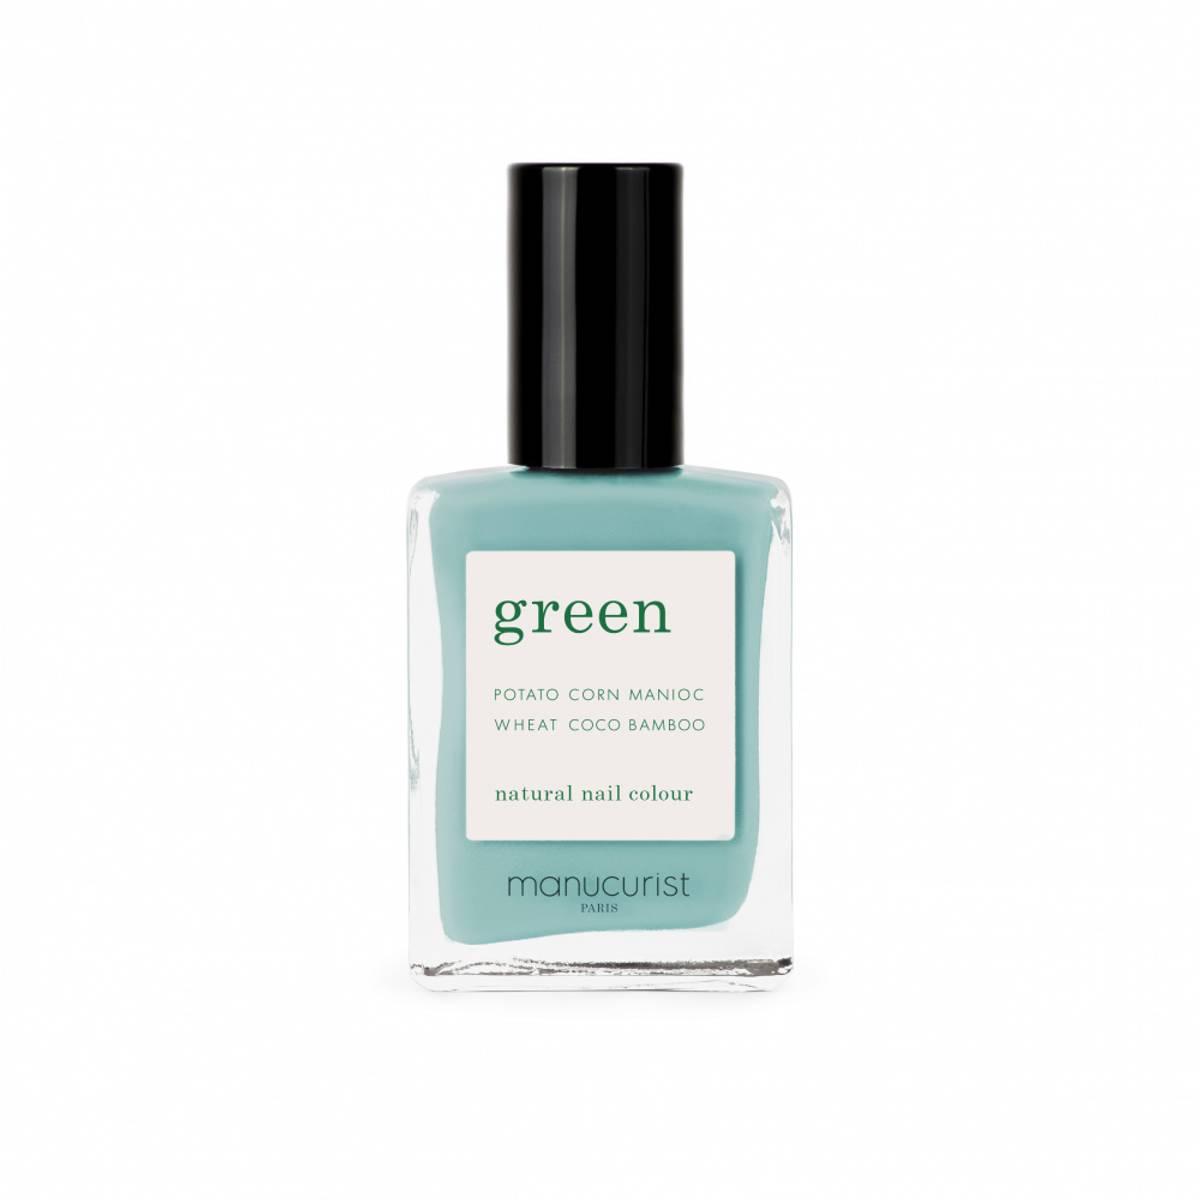 Seagreen | Neglelakk | Green by Manucurist